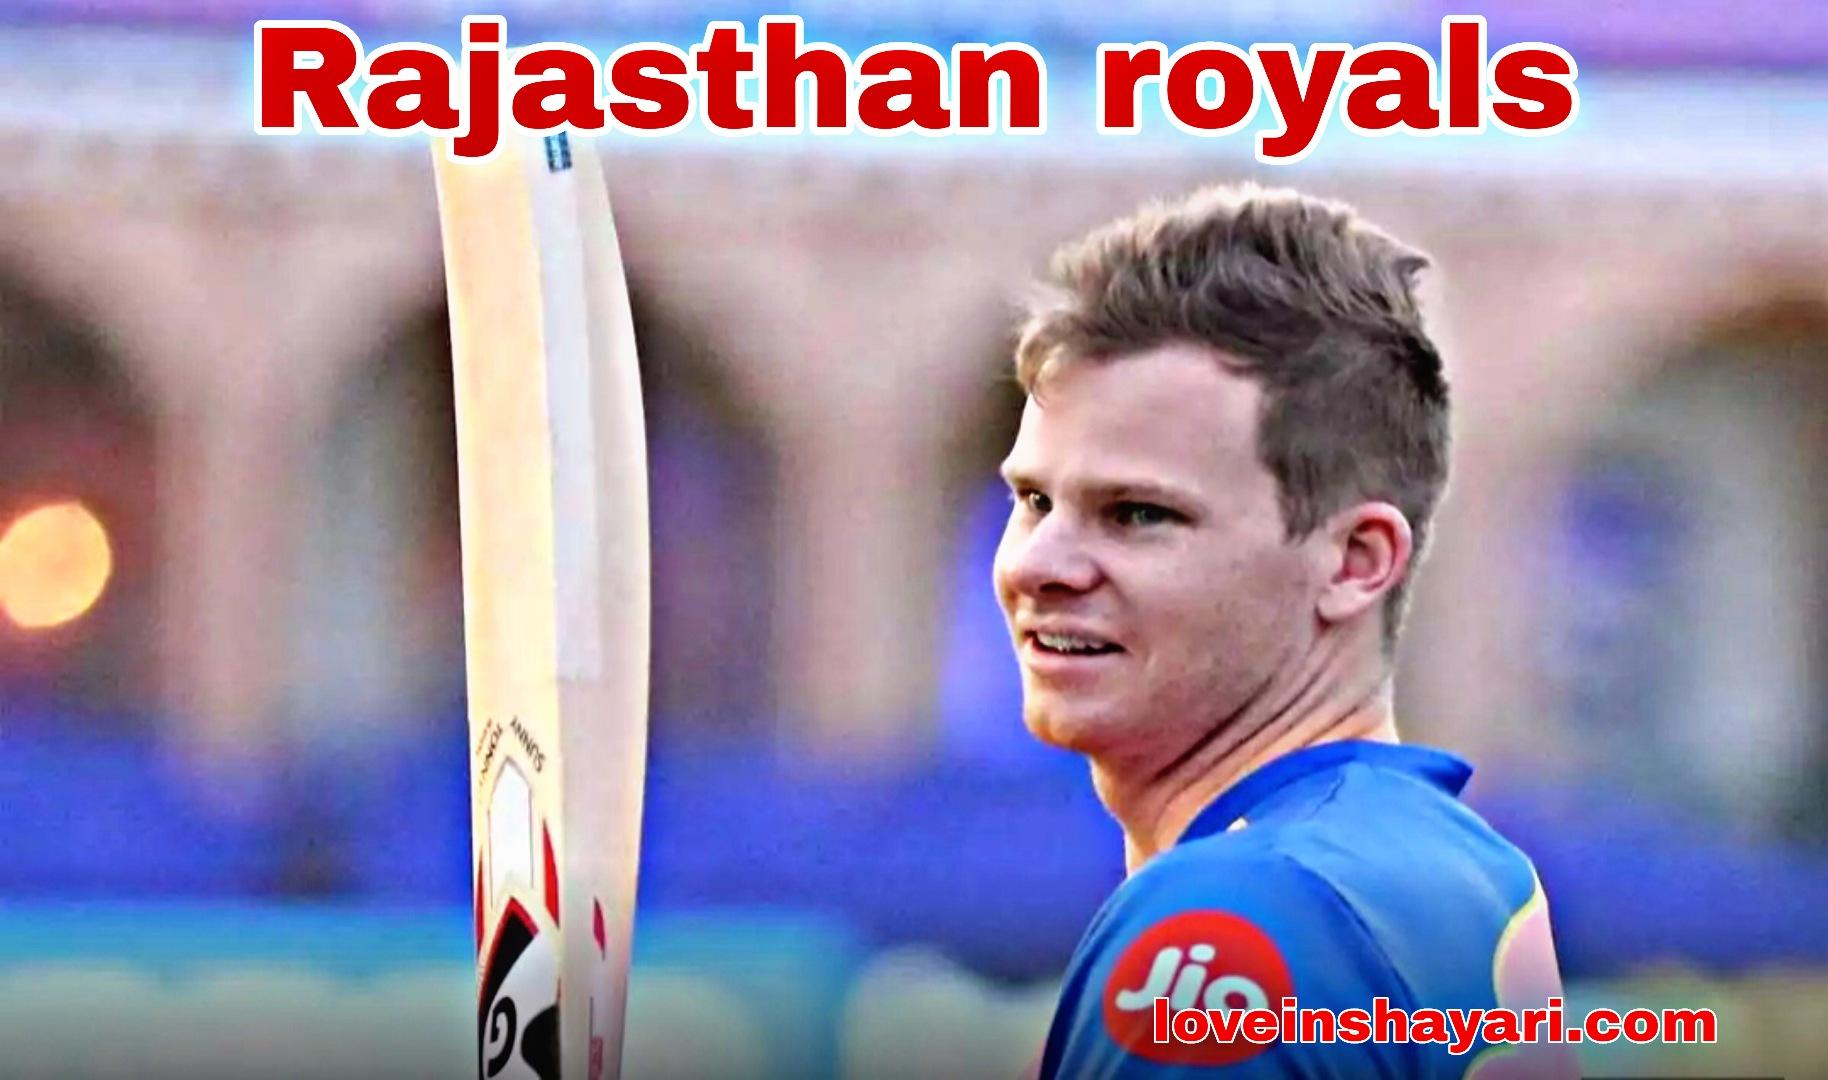 Rajasthan royals status whatsapp status